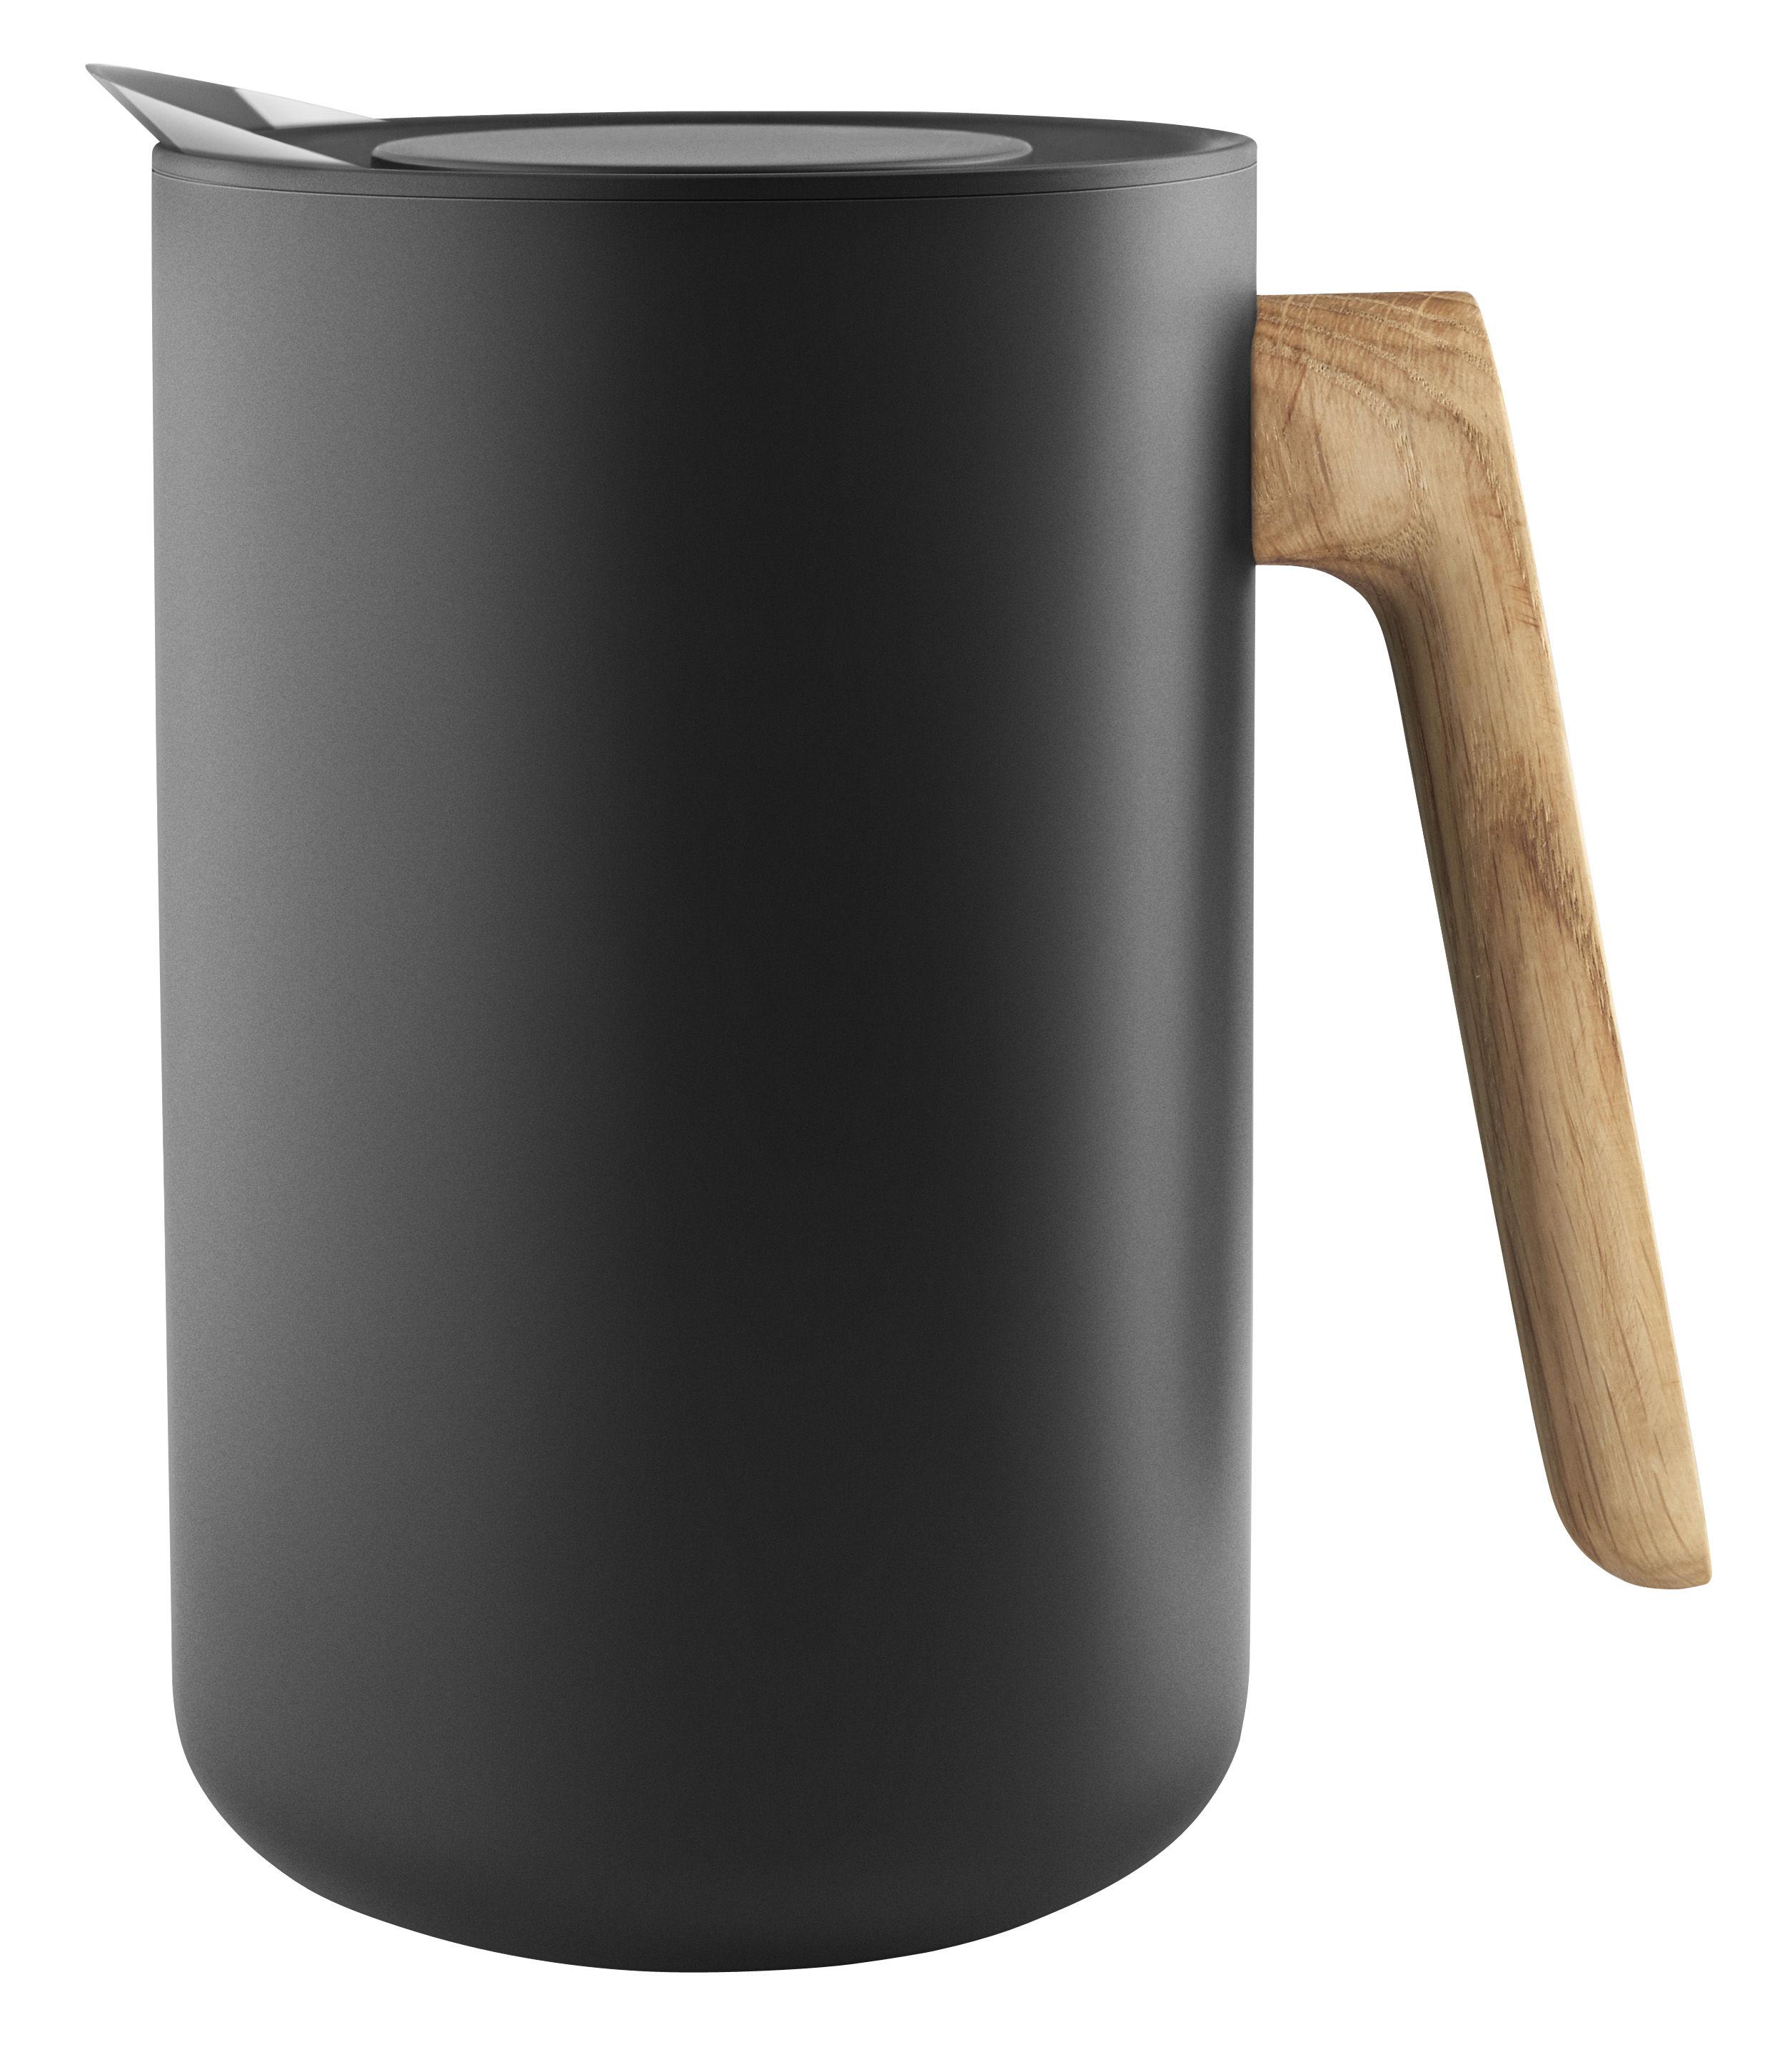 Tableware - Tea & Coffee Accessories - Nordic Kitchen Insulated jug - / 1 l - Steel & oak by Eva Solo - Mat black / Oak handle - Oak, Plastic material, Stainless steel